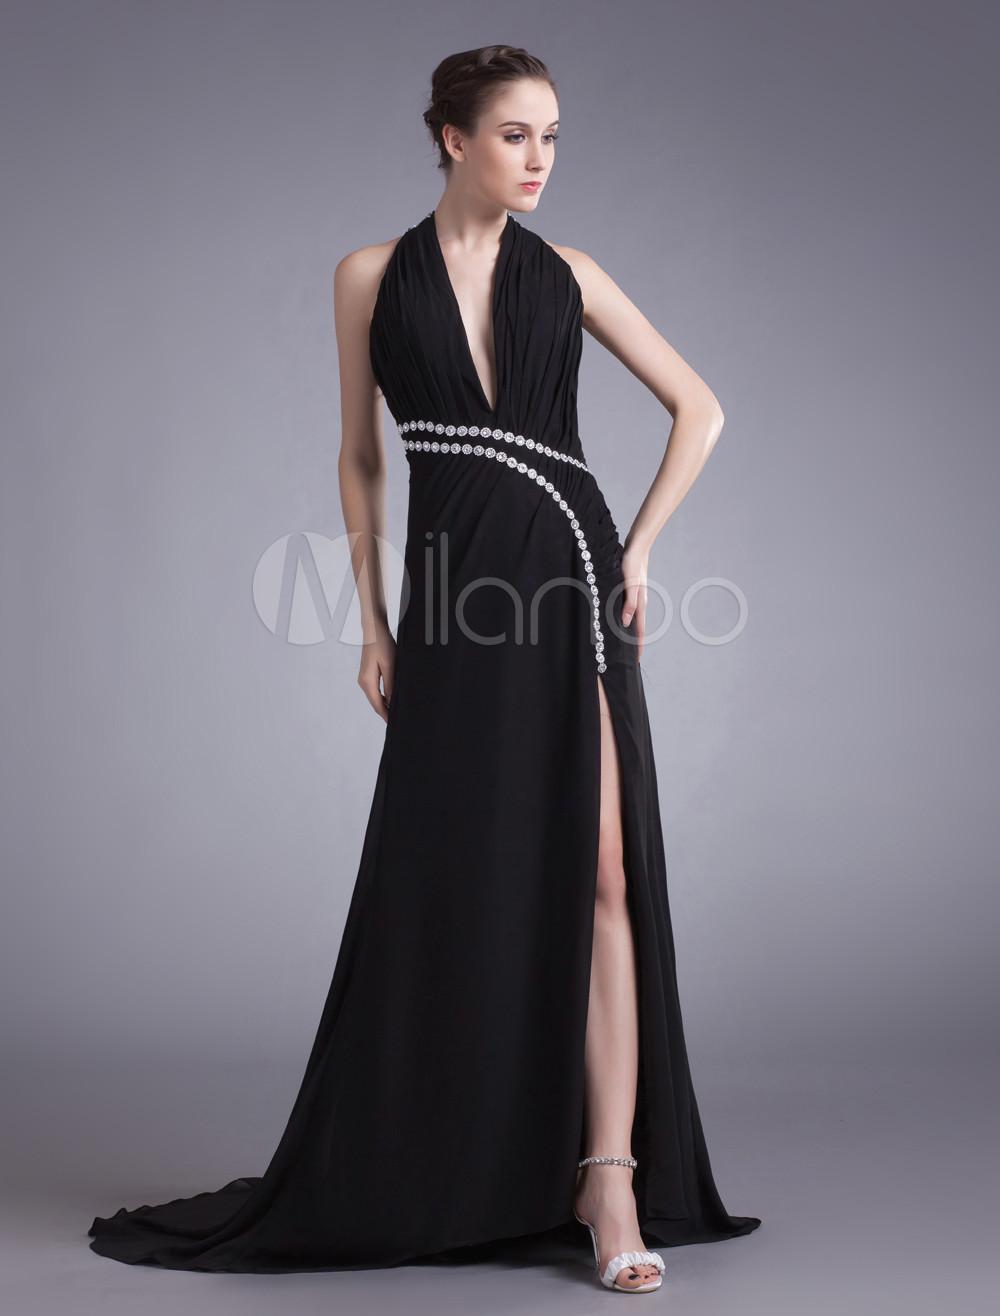 Sexy Black Chiffon Rhinestone Halter Fashion Evening Dress (Wedding Evening Dresses) photo